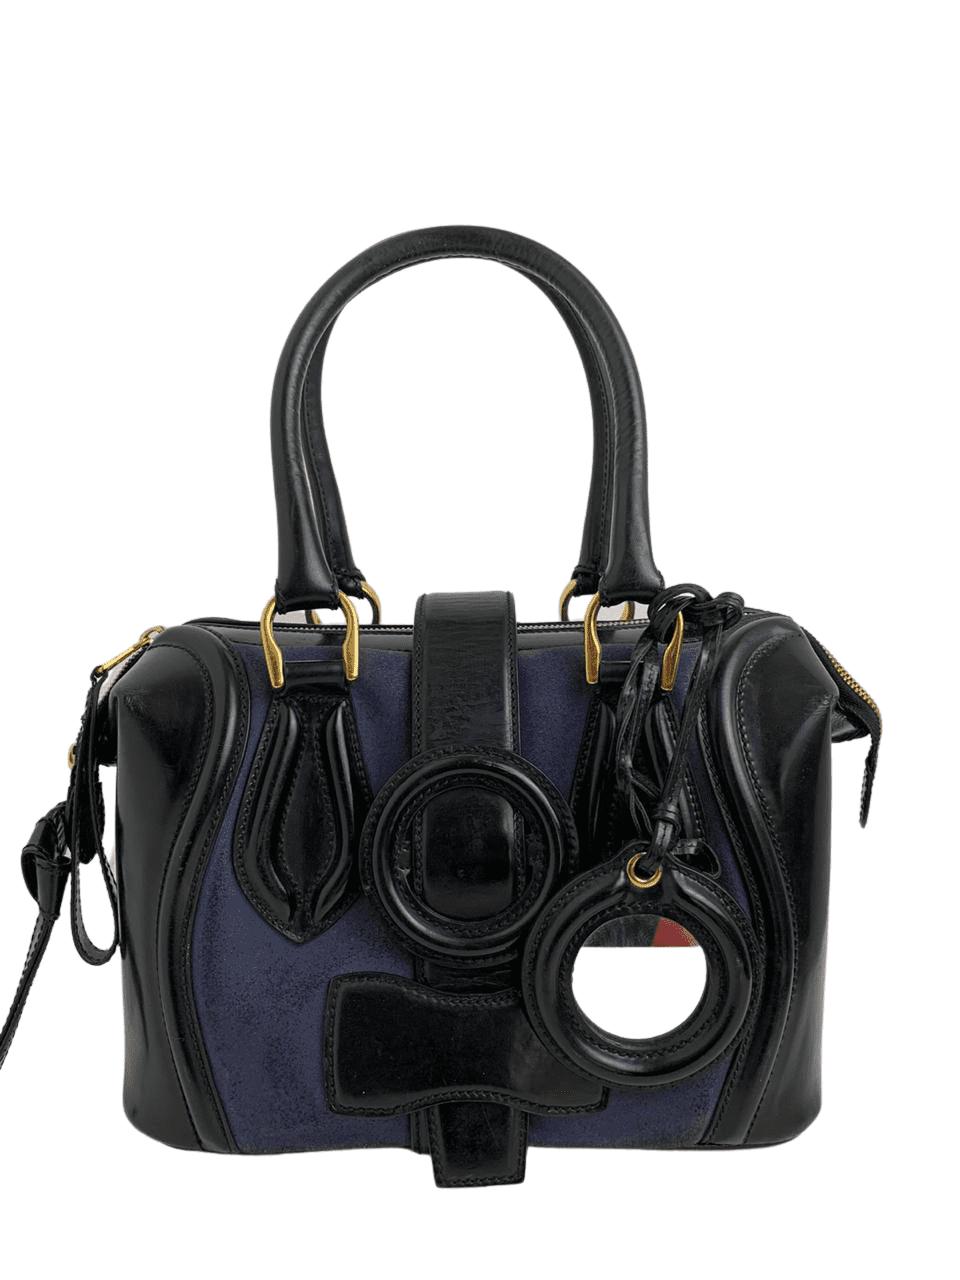 Bolsa Balenciaga Azul com Preto